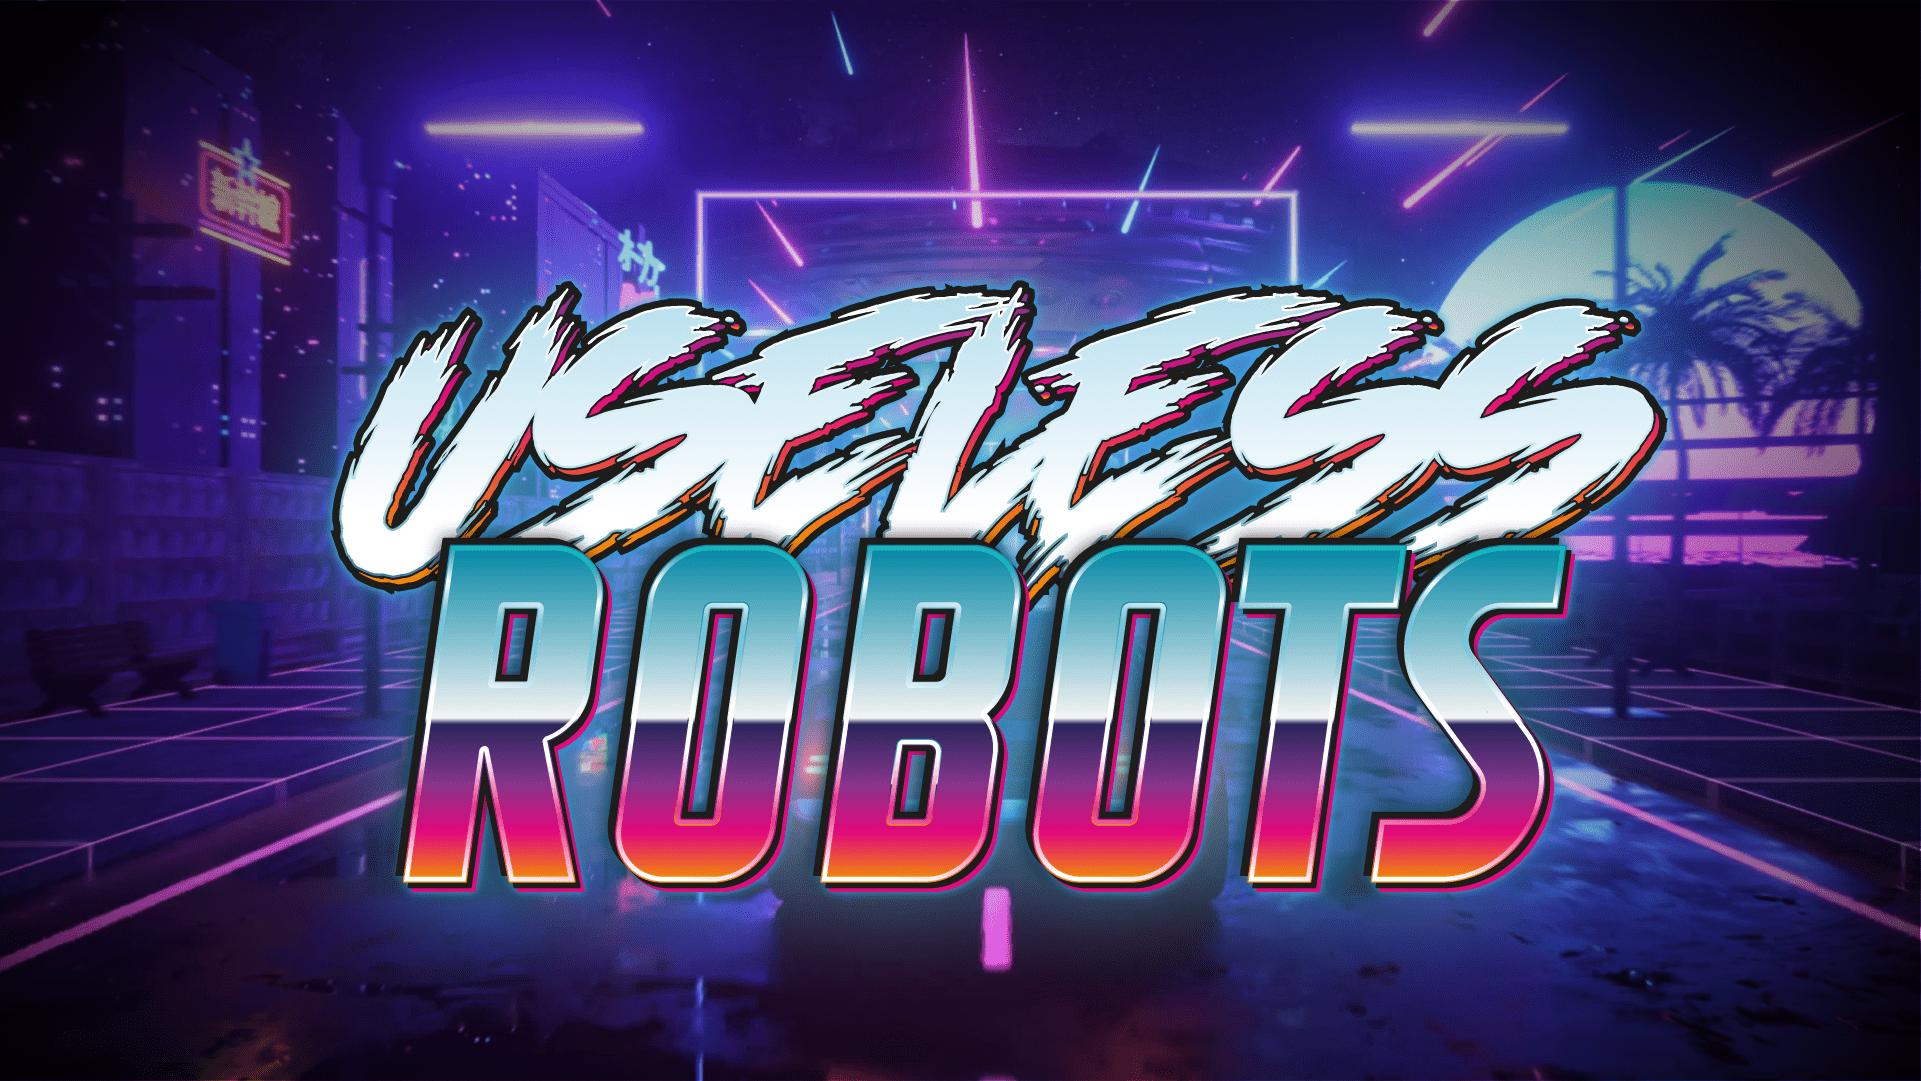 Useless Robots Logo